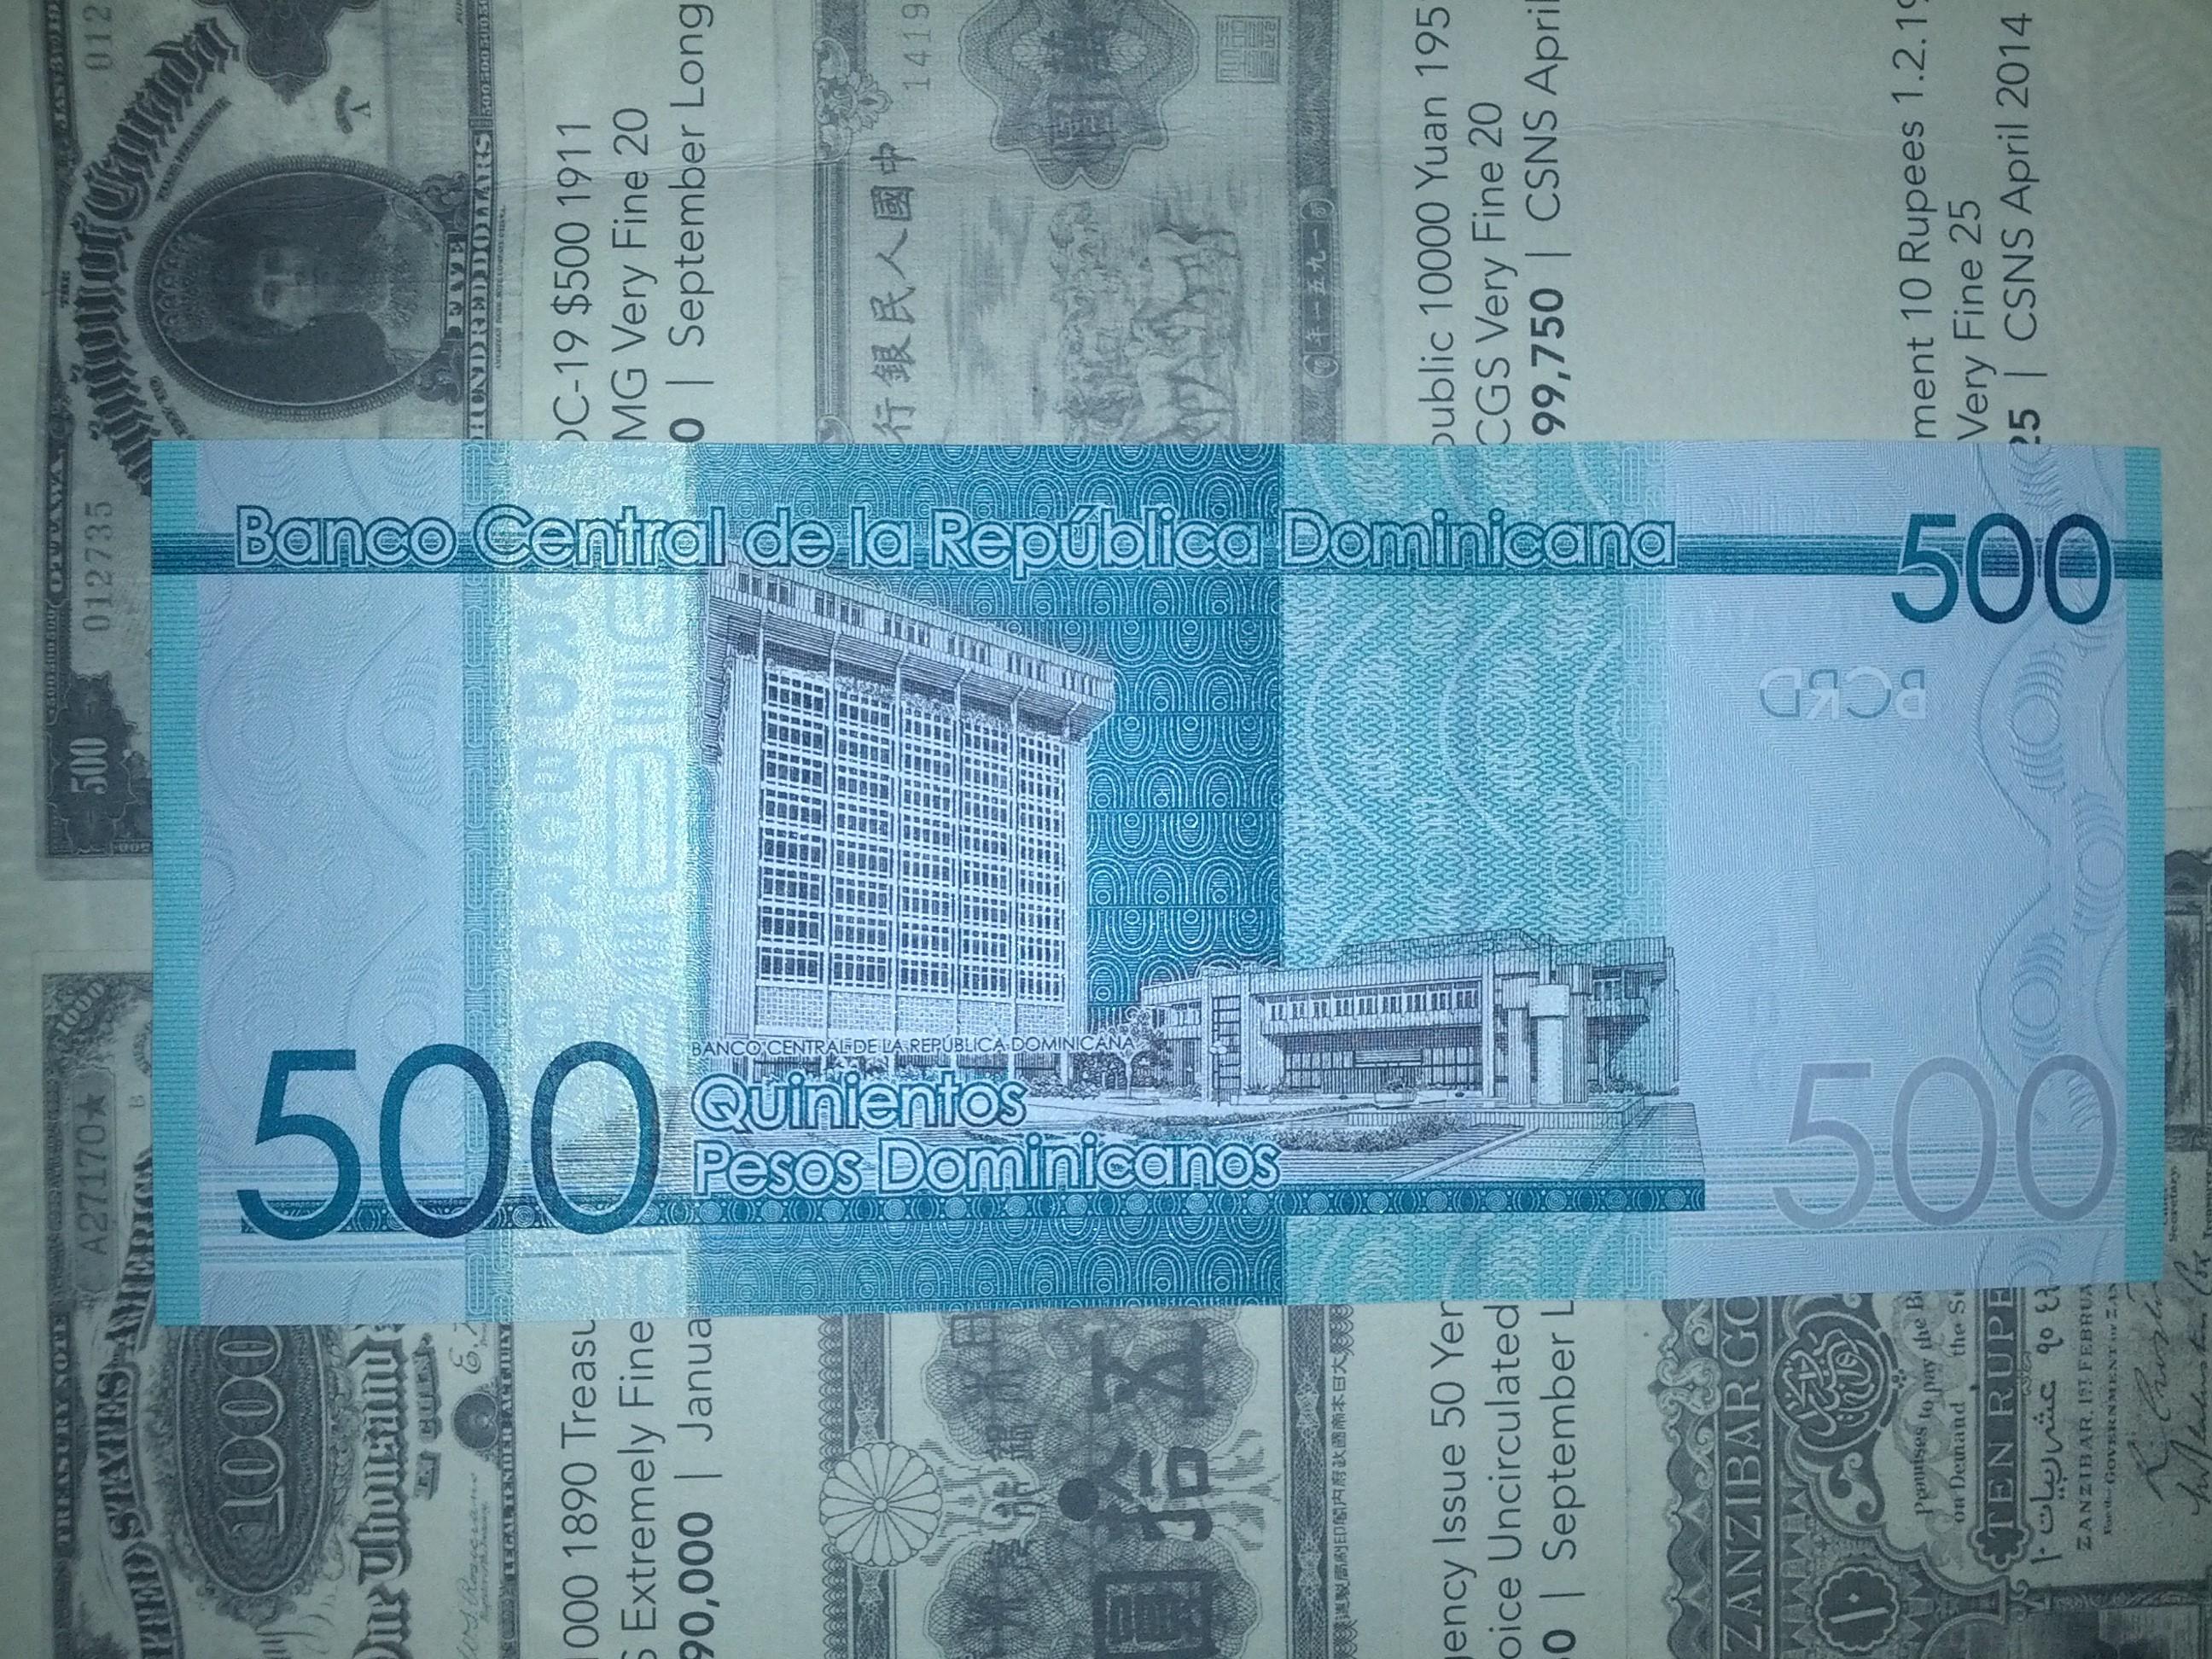 Republica Dominicana 500 pesos 2014 IMG_2014103a20